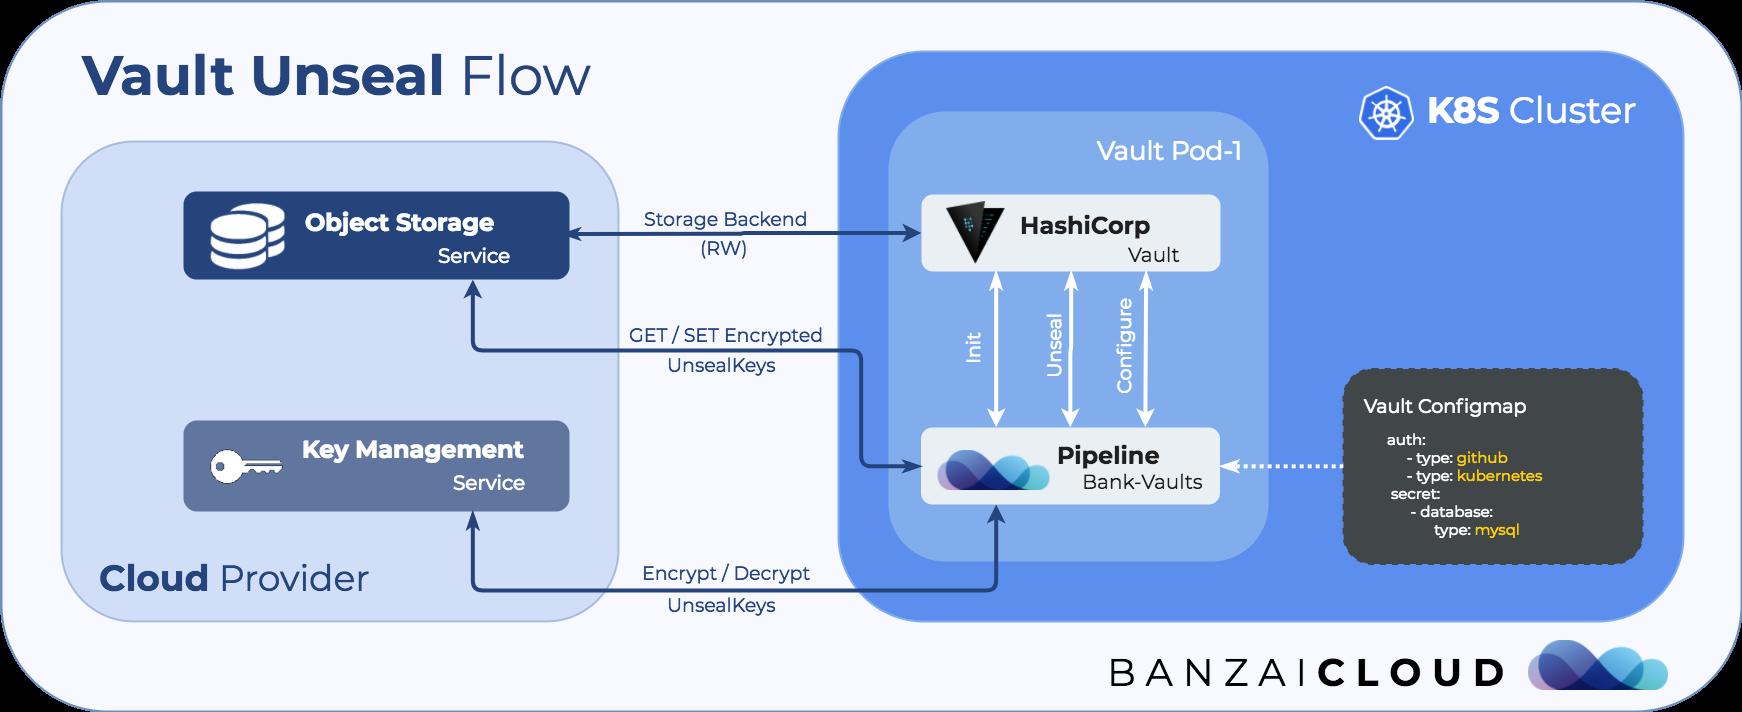 Vault unseal flow with KMS · Banzai Cloud